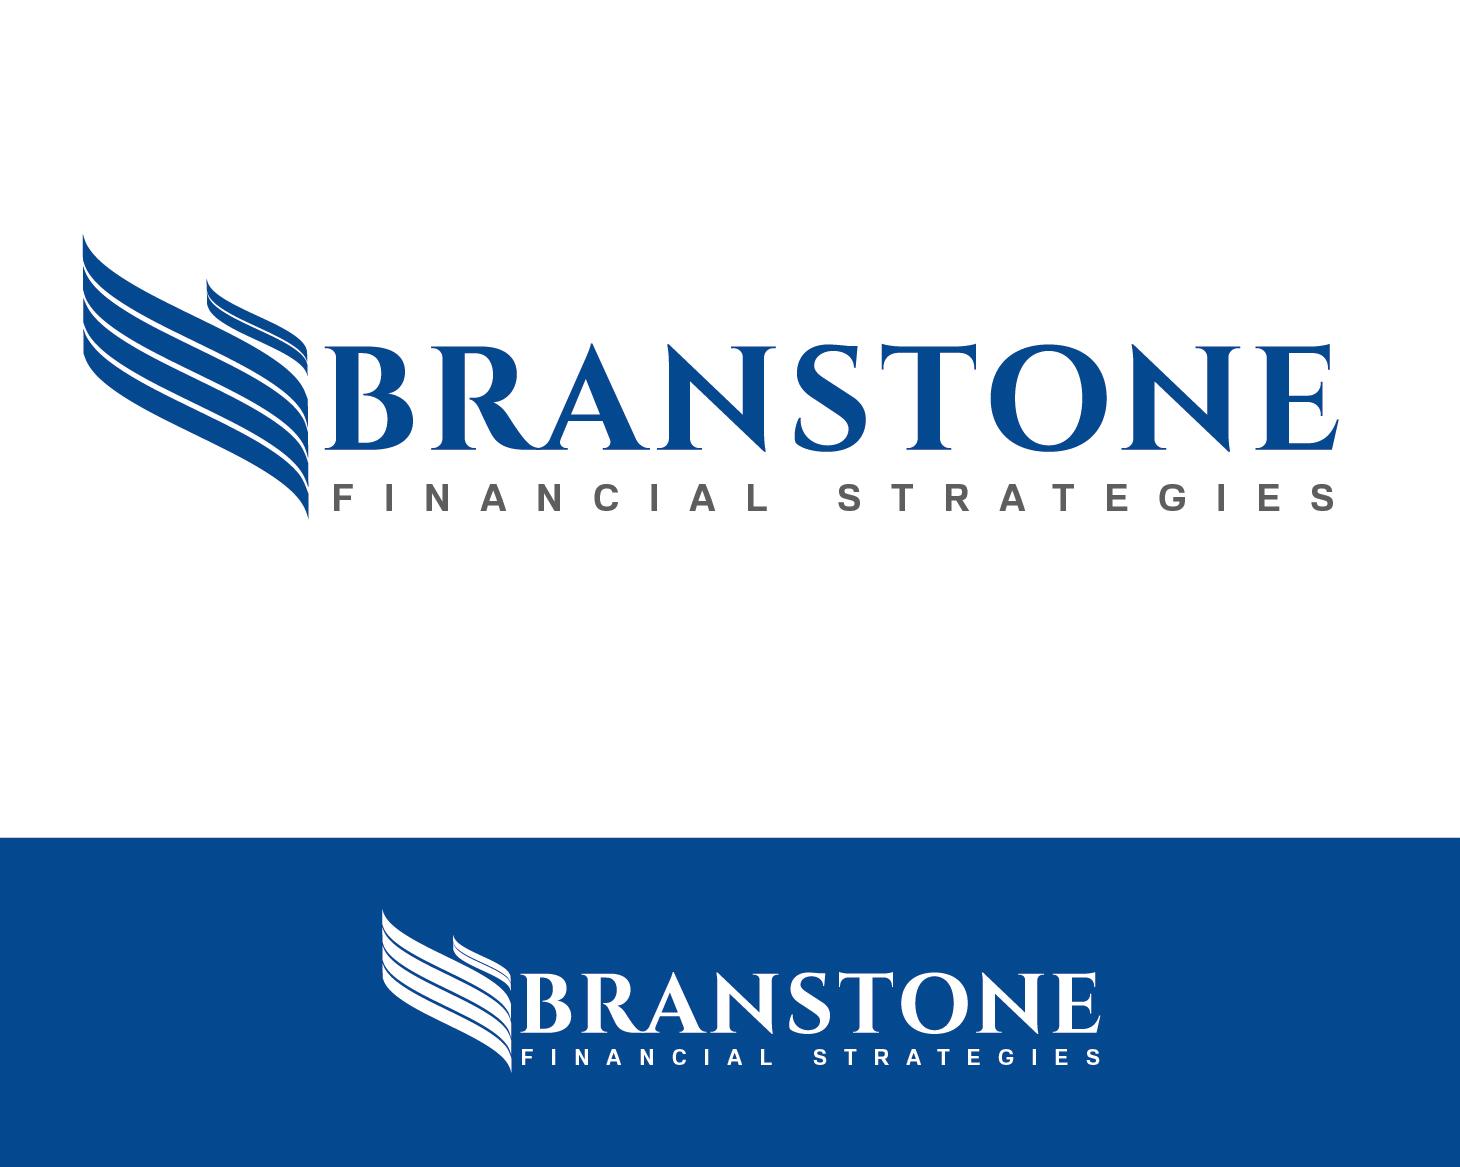 Logo Design by VENTSISLAV KOVACHEV - Entry No. 226 in the Logo Design Contest Inspiring Logo Design for Branstone Financial Strategies.